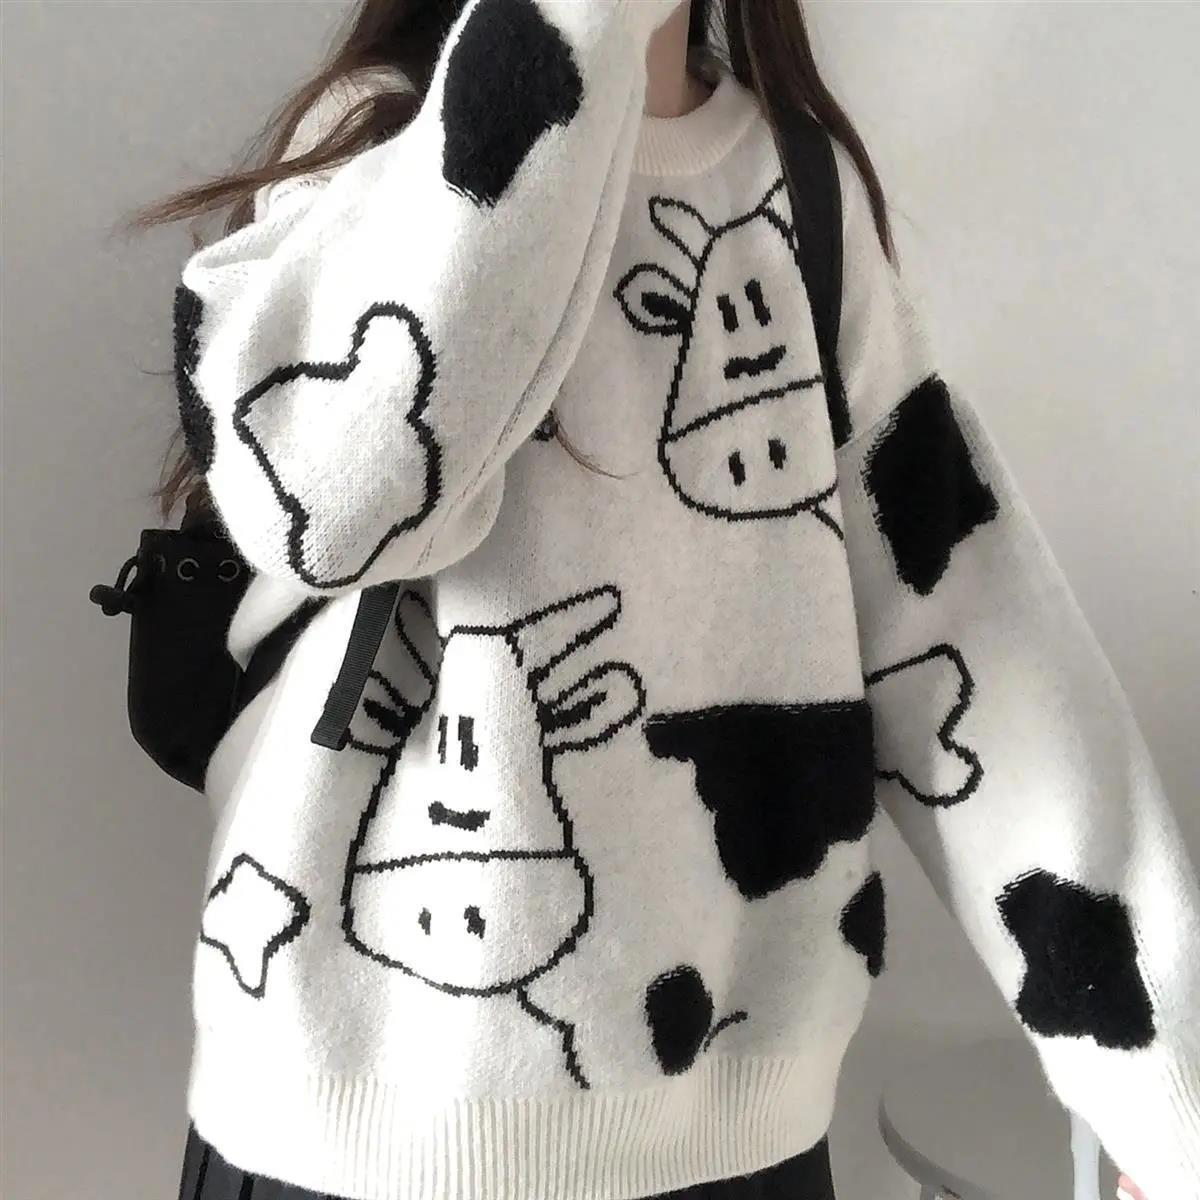 Egirl Harajuku pullover with a cow print 41